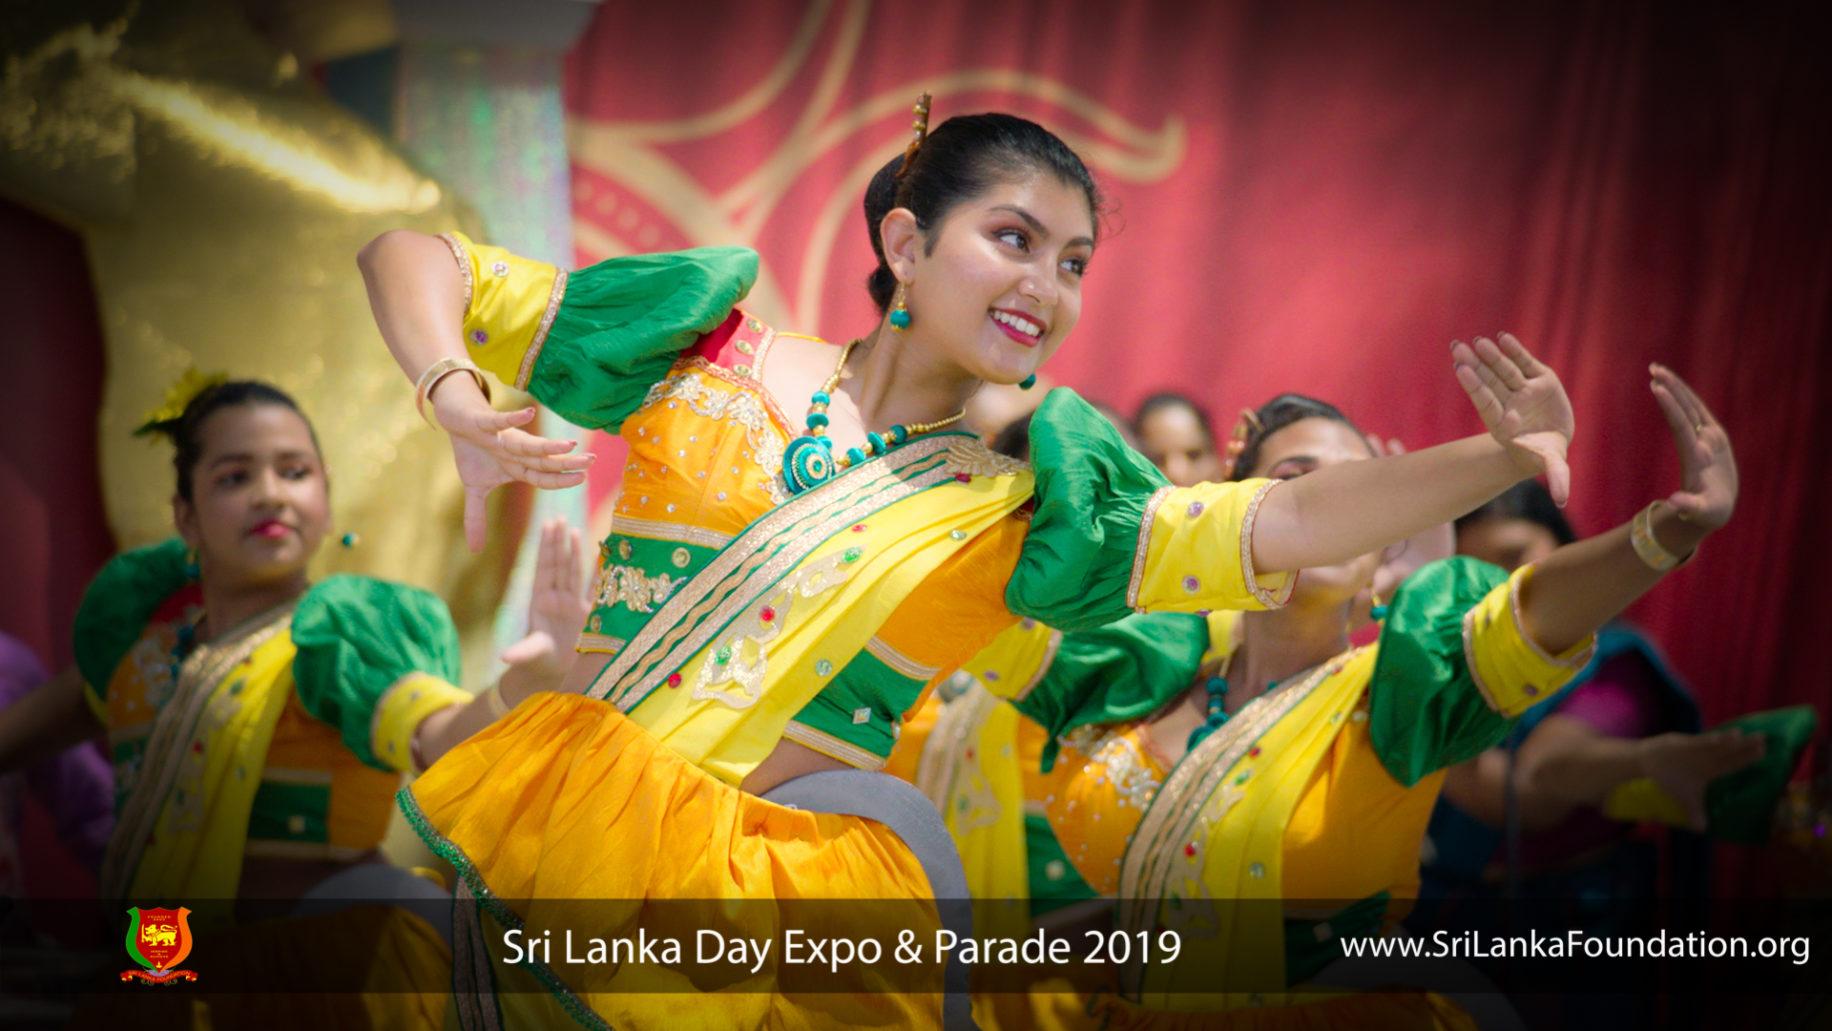 Sri Lanka Day 2019 Highlight Reel